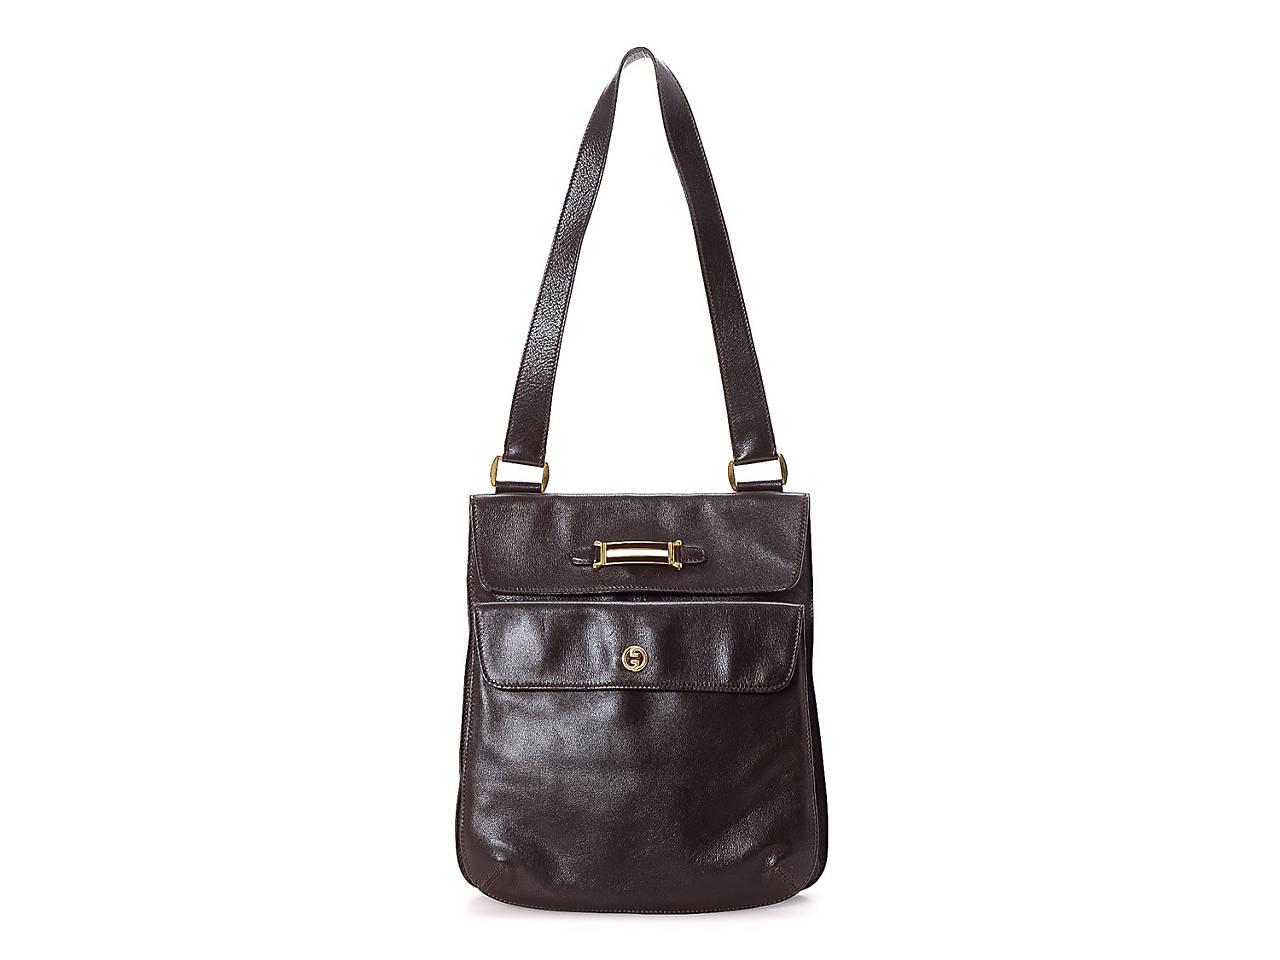 c8db98fa2cc Gucci - Vintage Luxury Leather Shoulder Bag Women s Handbags ...